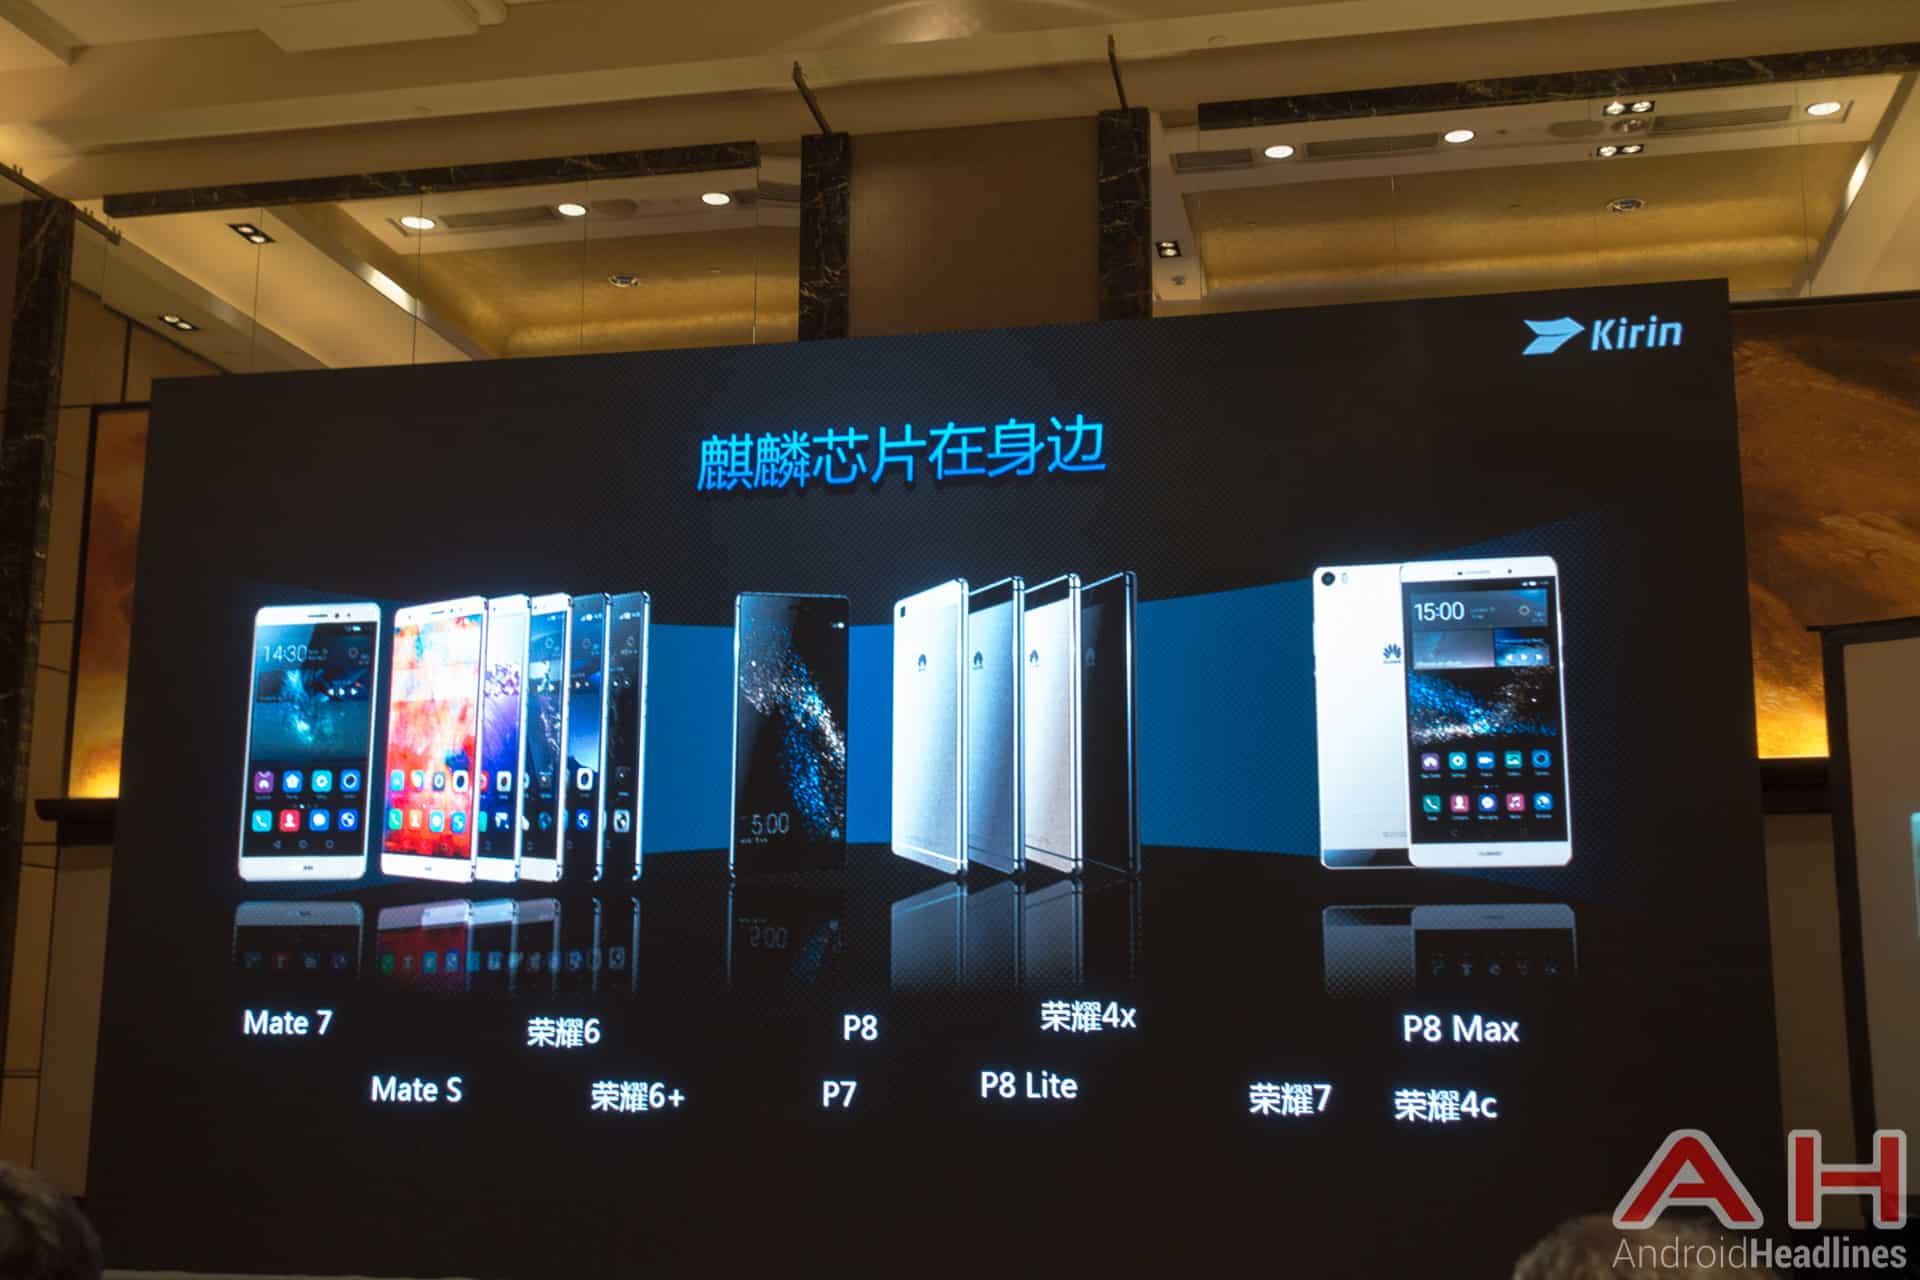 Huawei Kirin 950 AH 4 3